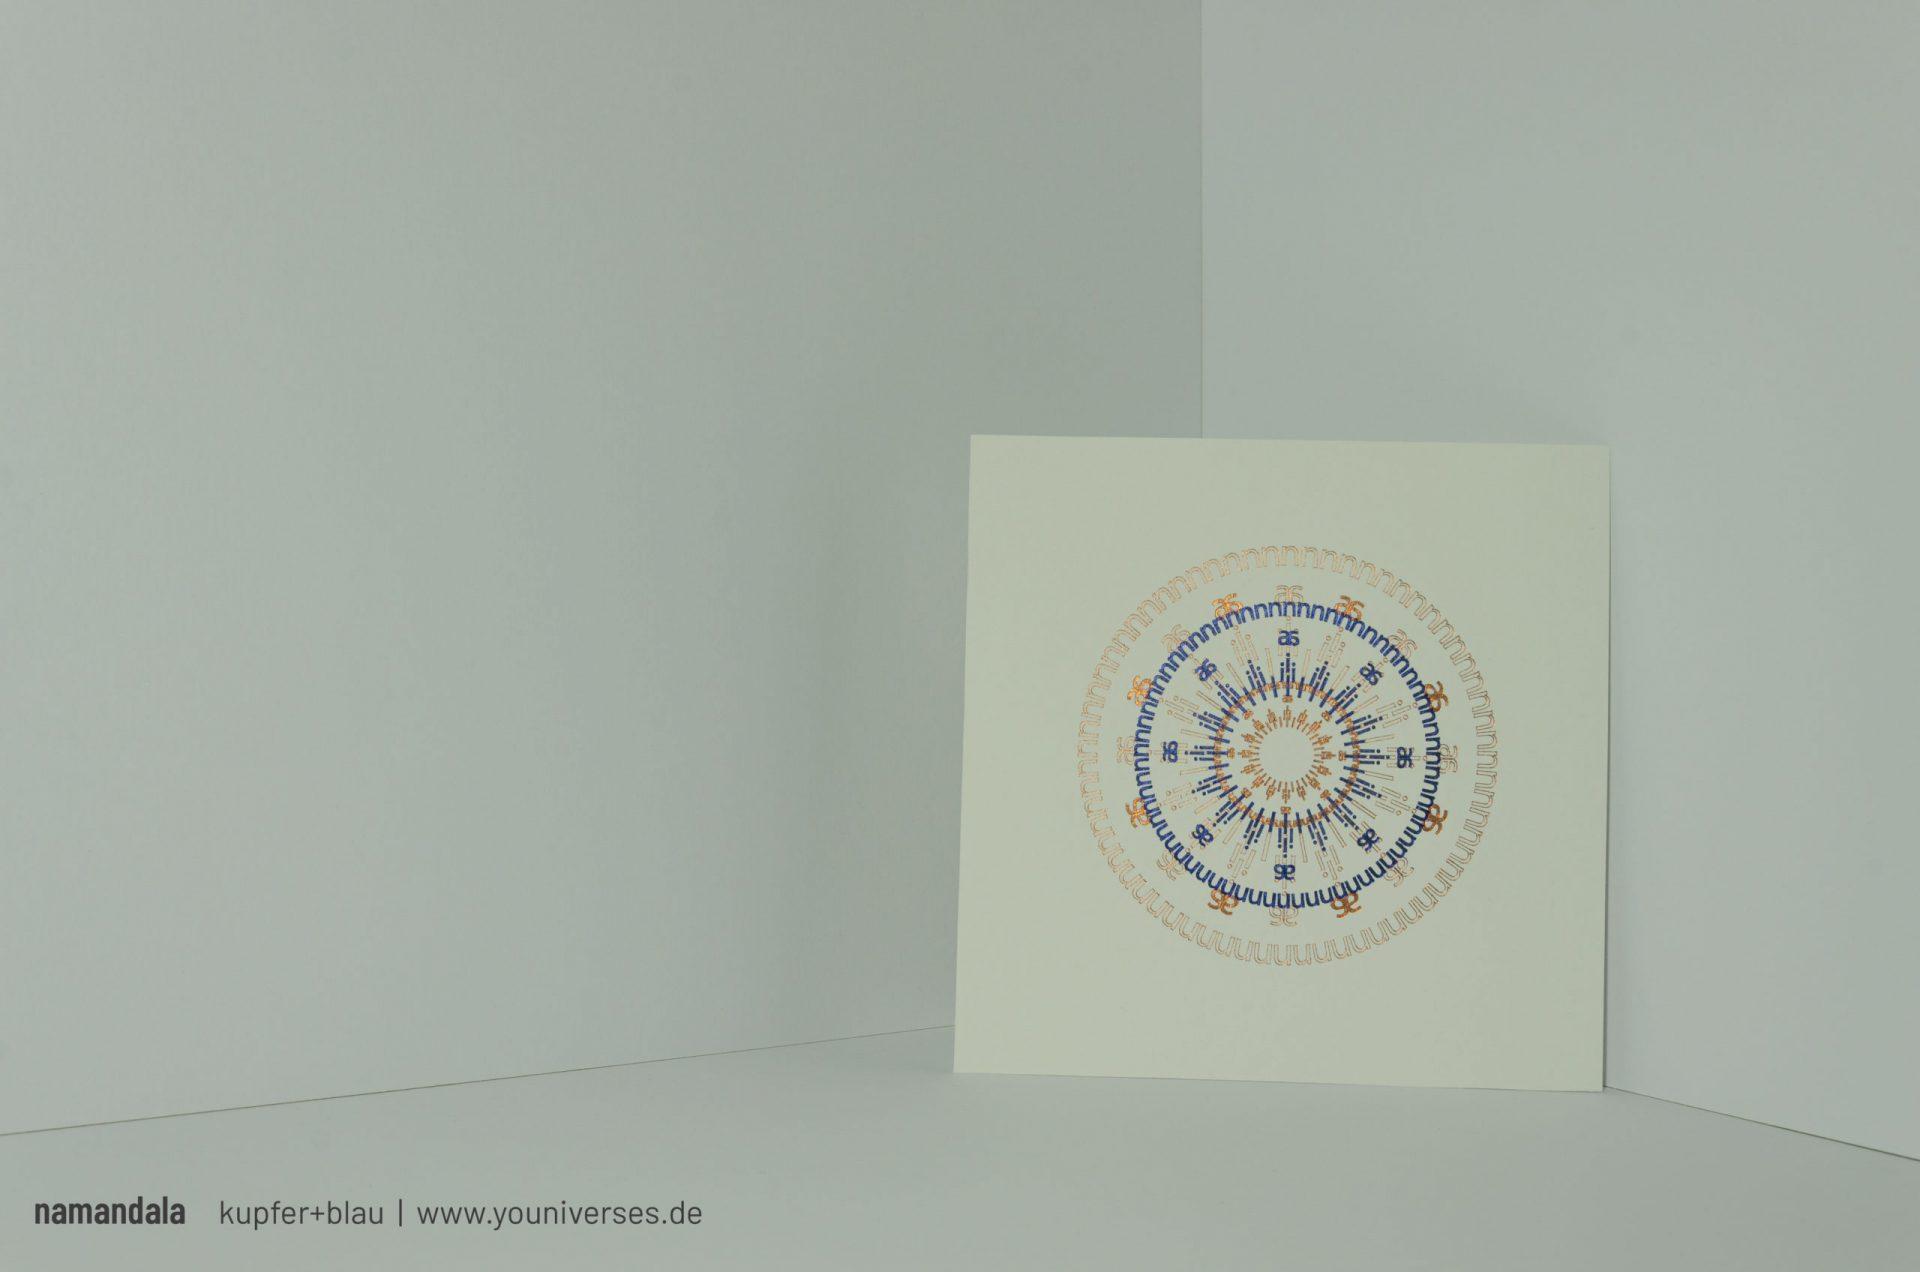 namandala lian // kupfer // blau // Papier: aqua rau. YOUNIVERSES Atelier für achtsames & spirituelles Design, Herdwangen-Schönach, Pfullendorf, Sigmaringen, Überlingen. Womenhood. Weiblichkeit. Female empowerment.